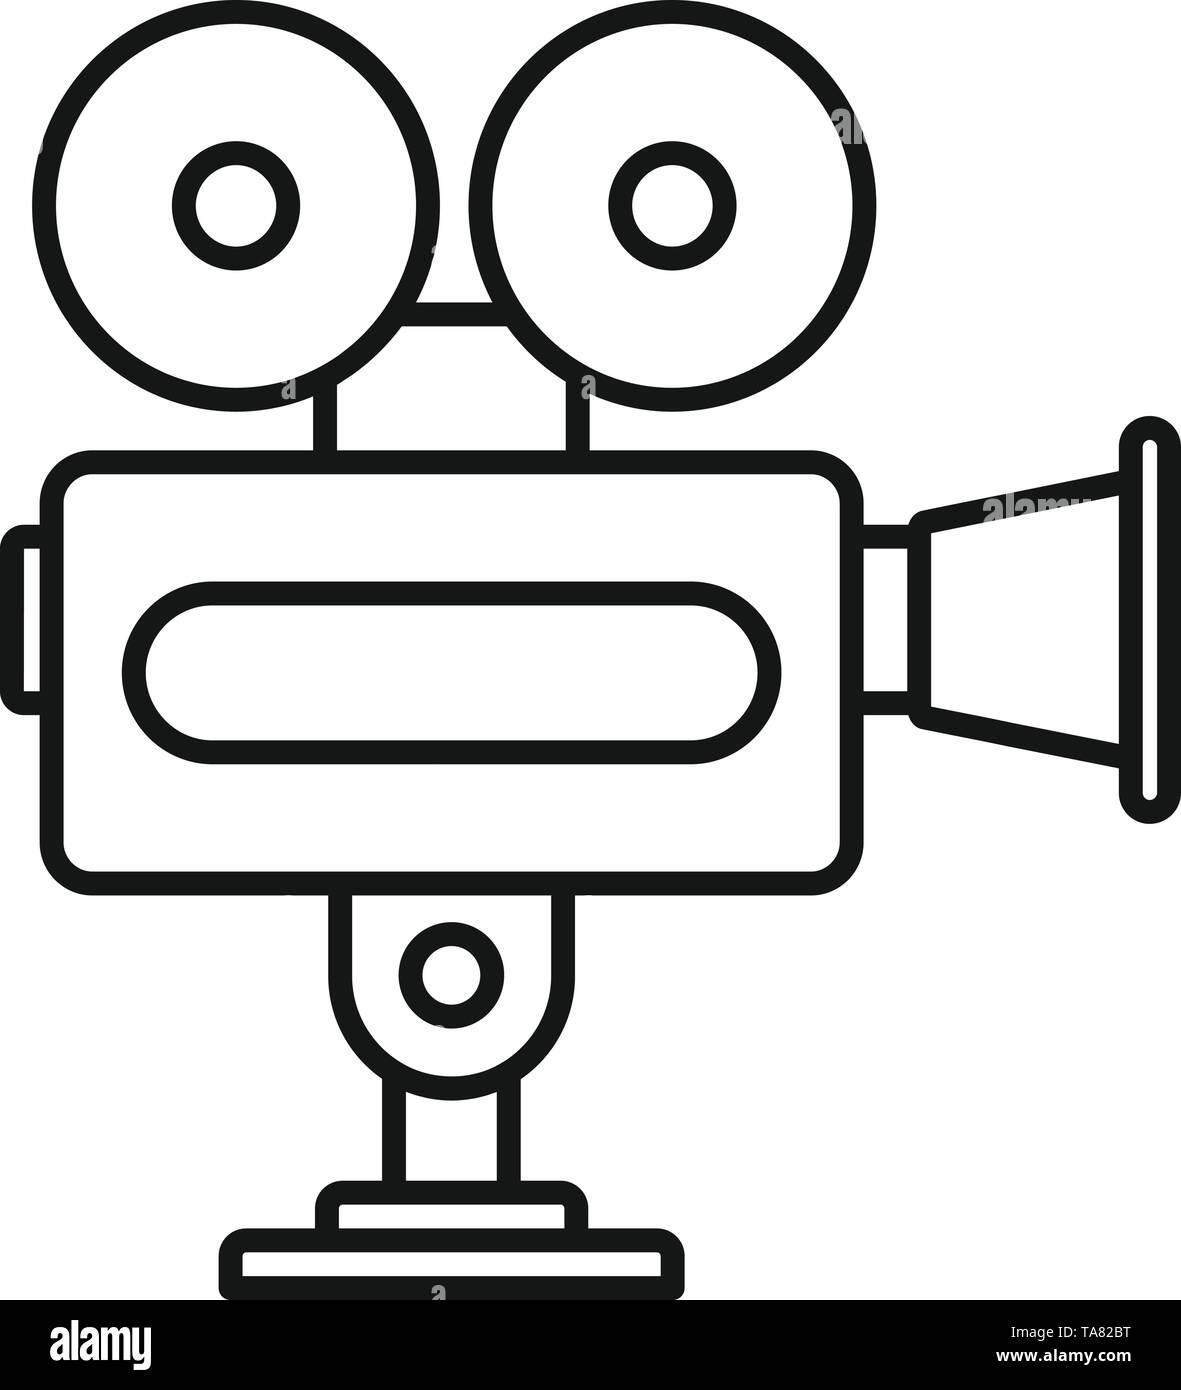 Cinema camera icon. Outline cinema camera vector icon for web design isolated on white background - Stock Image